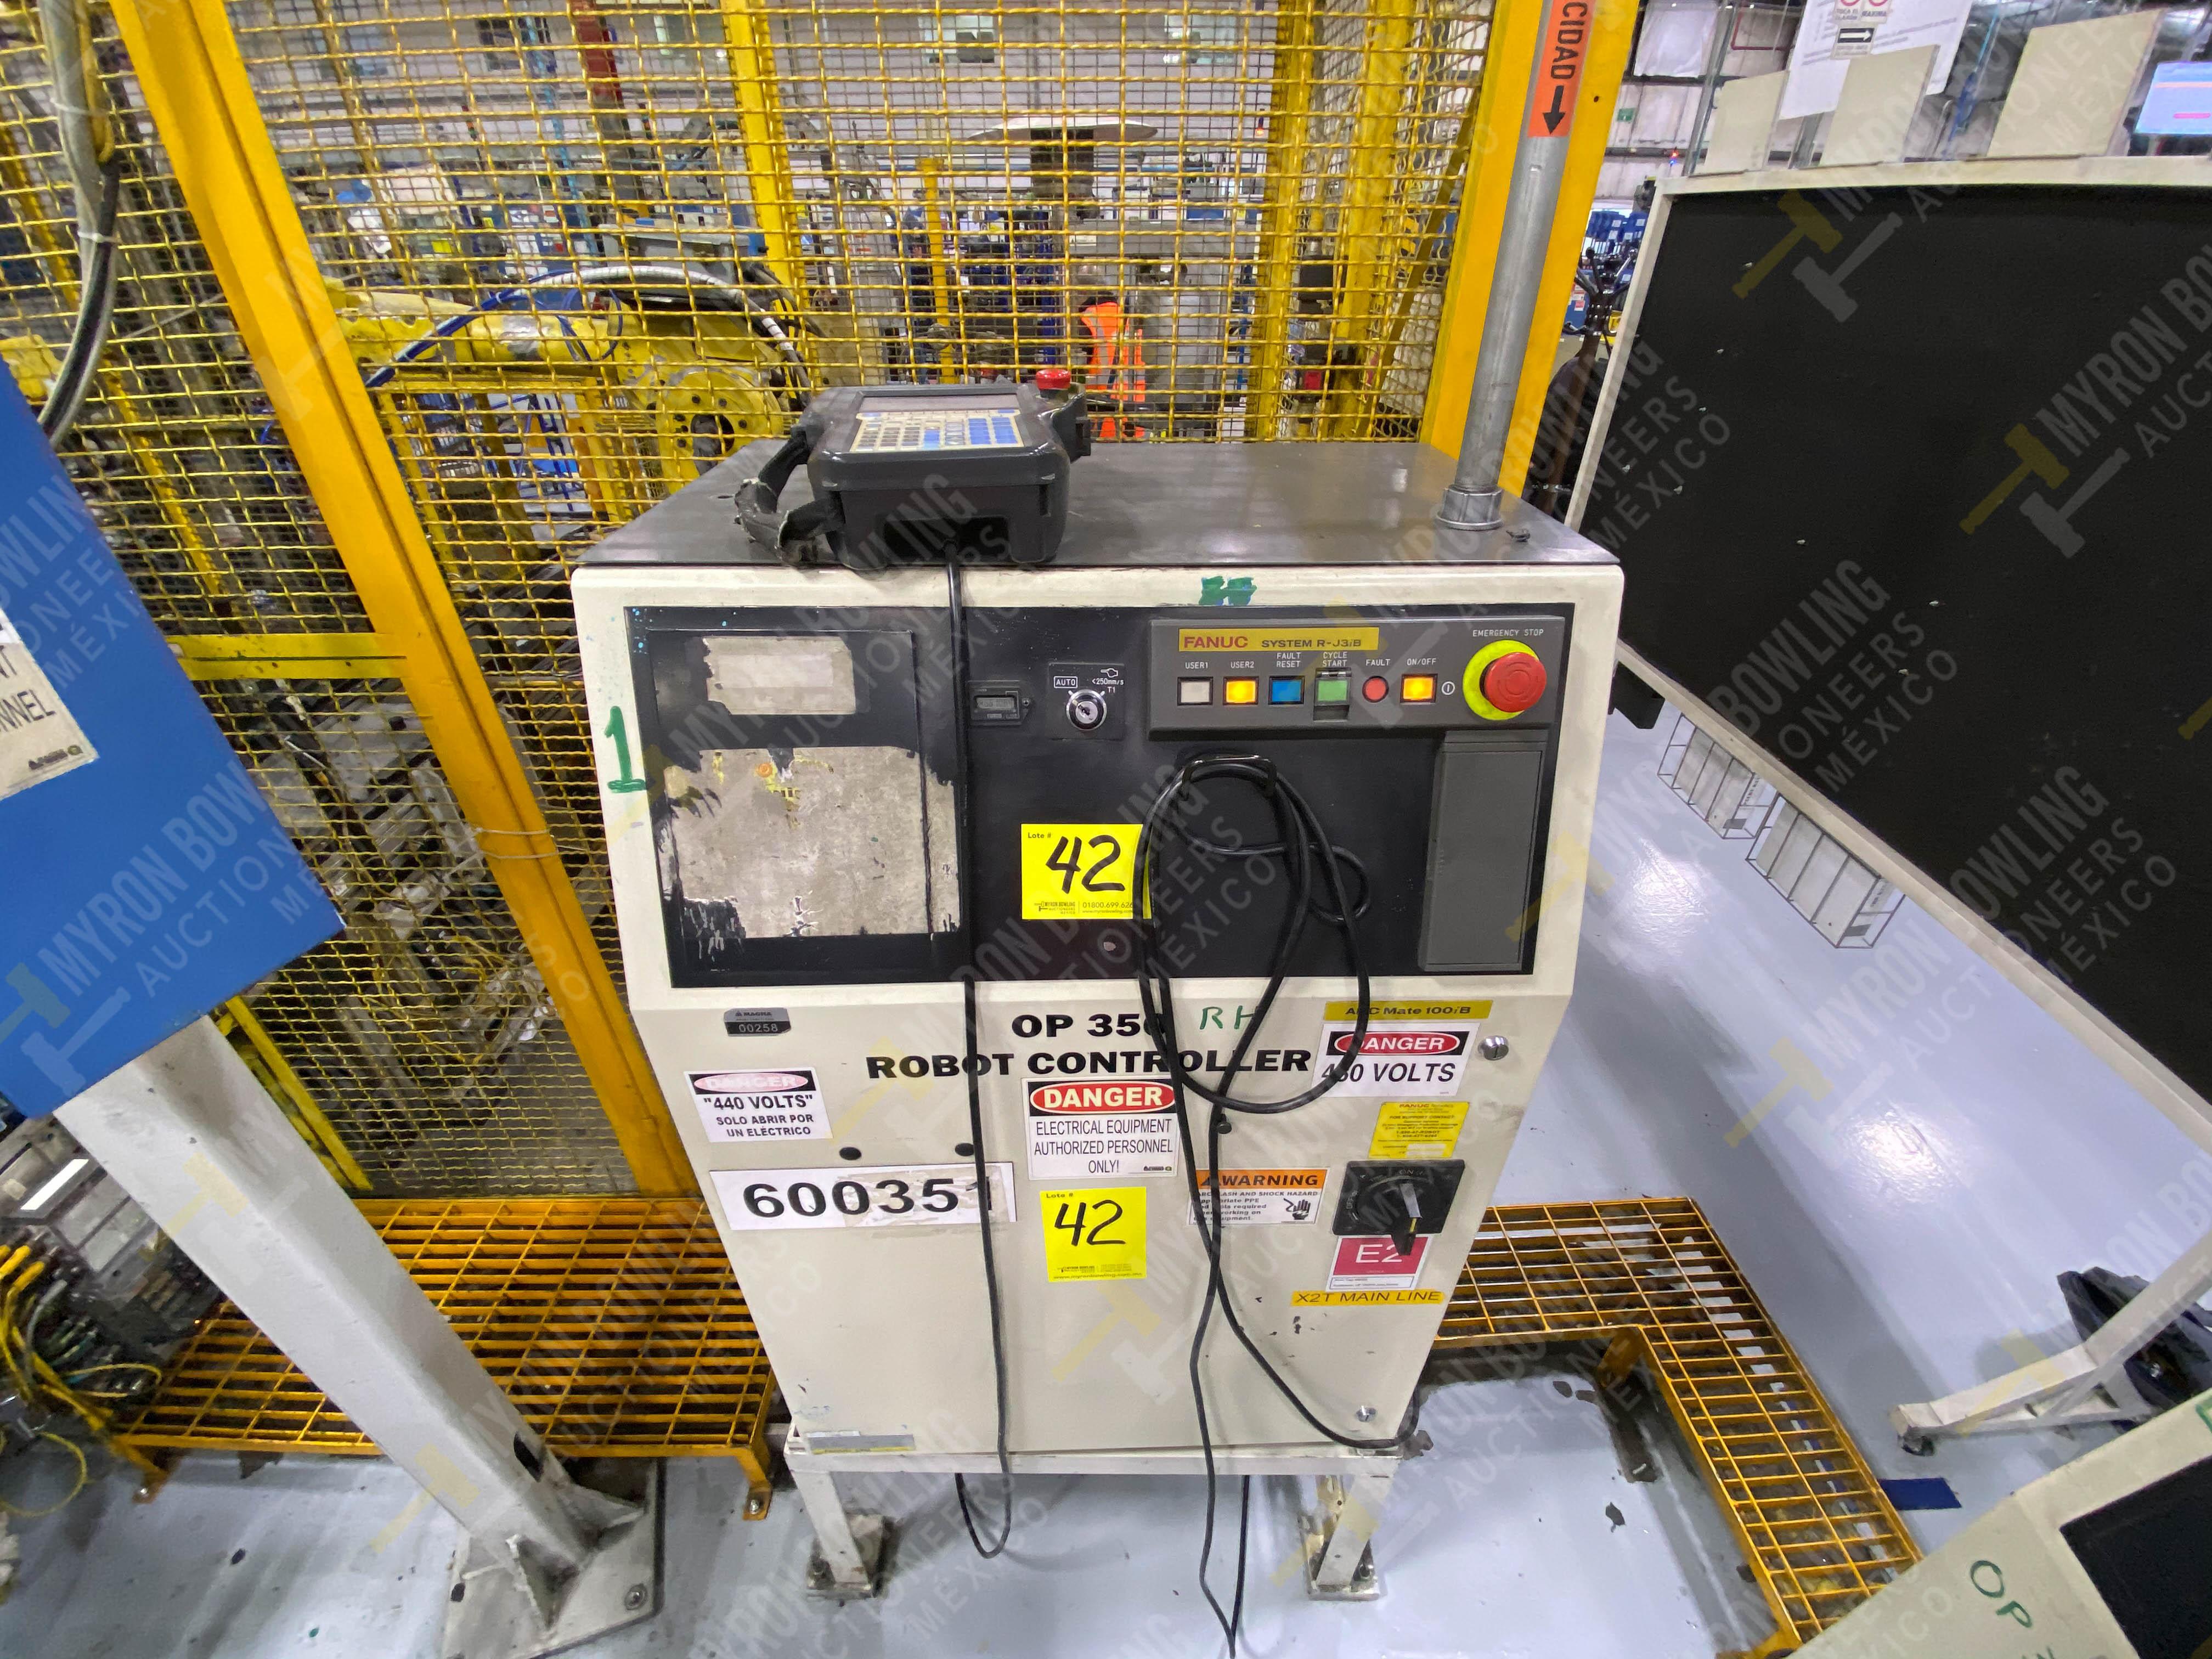 Robot marca Fanuc con capacidad de carga de 15-30 Kg, controlador de robot y teach pendant - Image 9 of 14